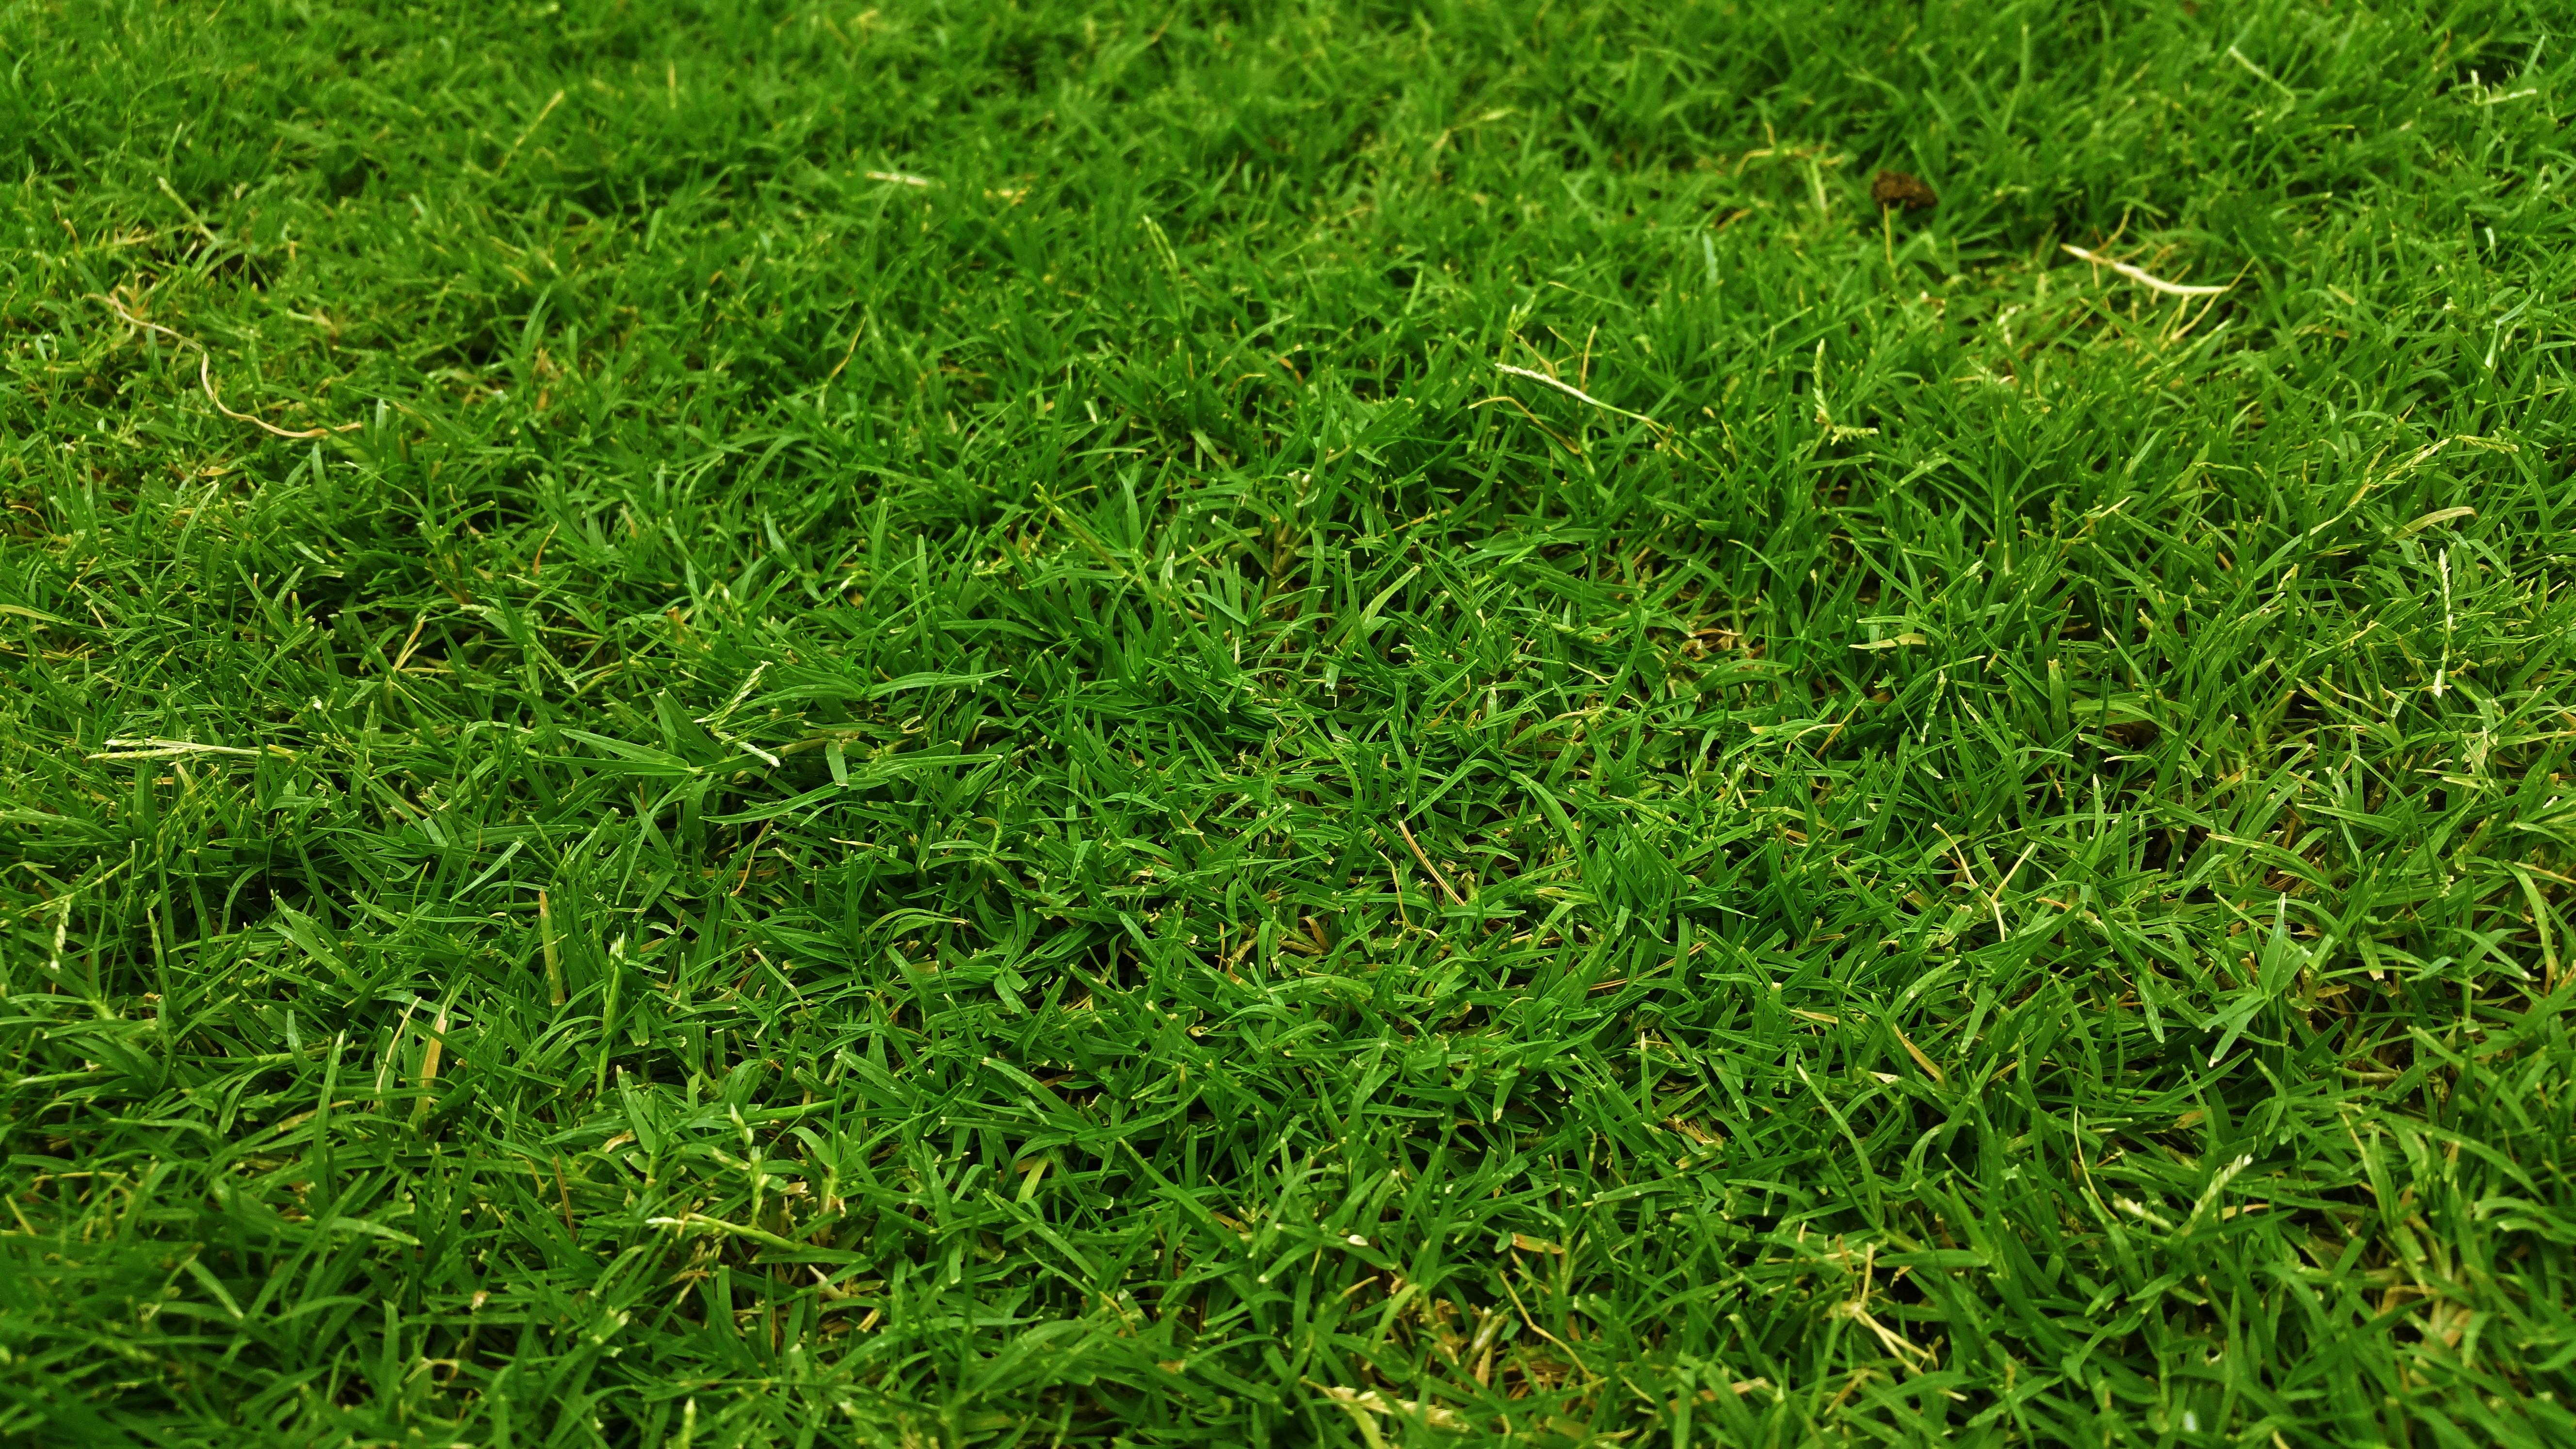 Free Images Ground Lawn Meadow Leaf Flower Soil Grassy Grassland Playground Shrub Grasslands Grass Land Green Flooring Flowering Plant